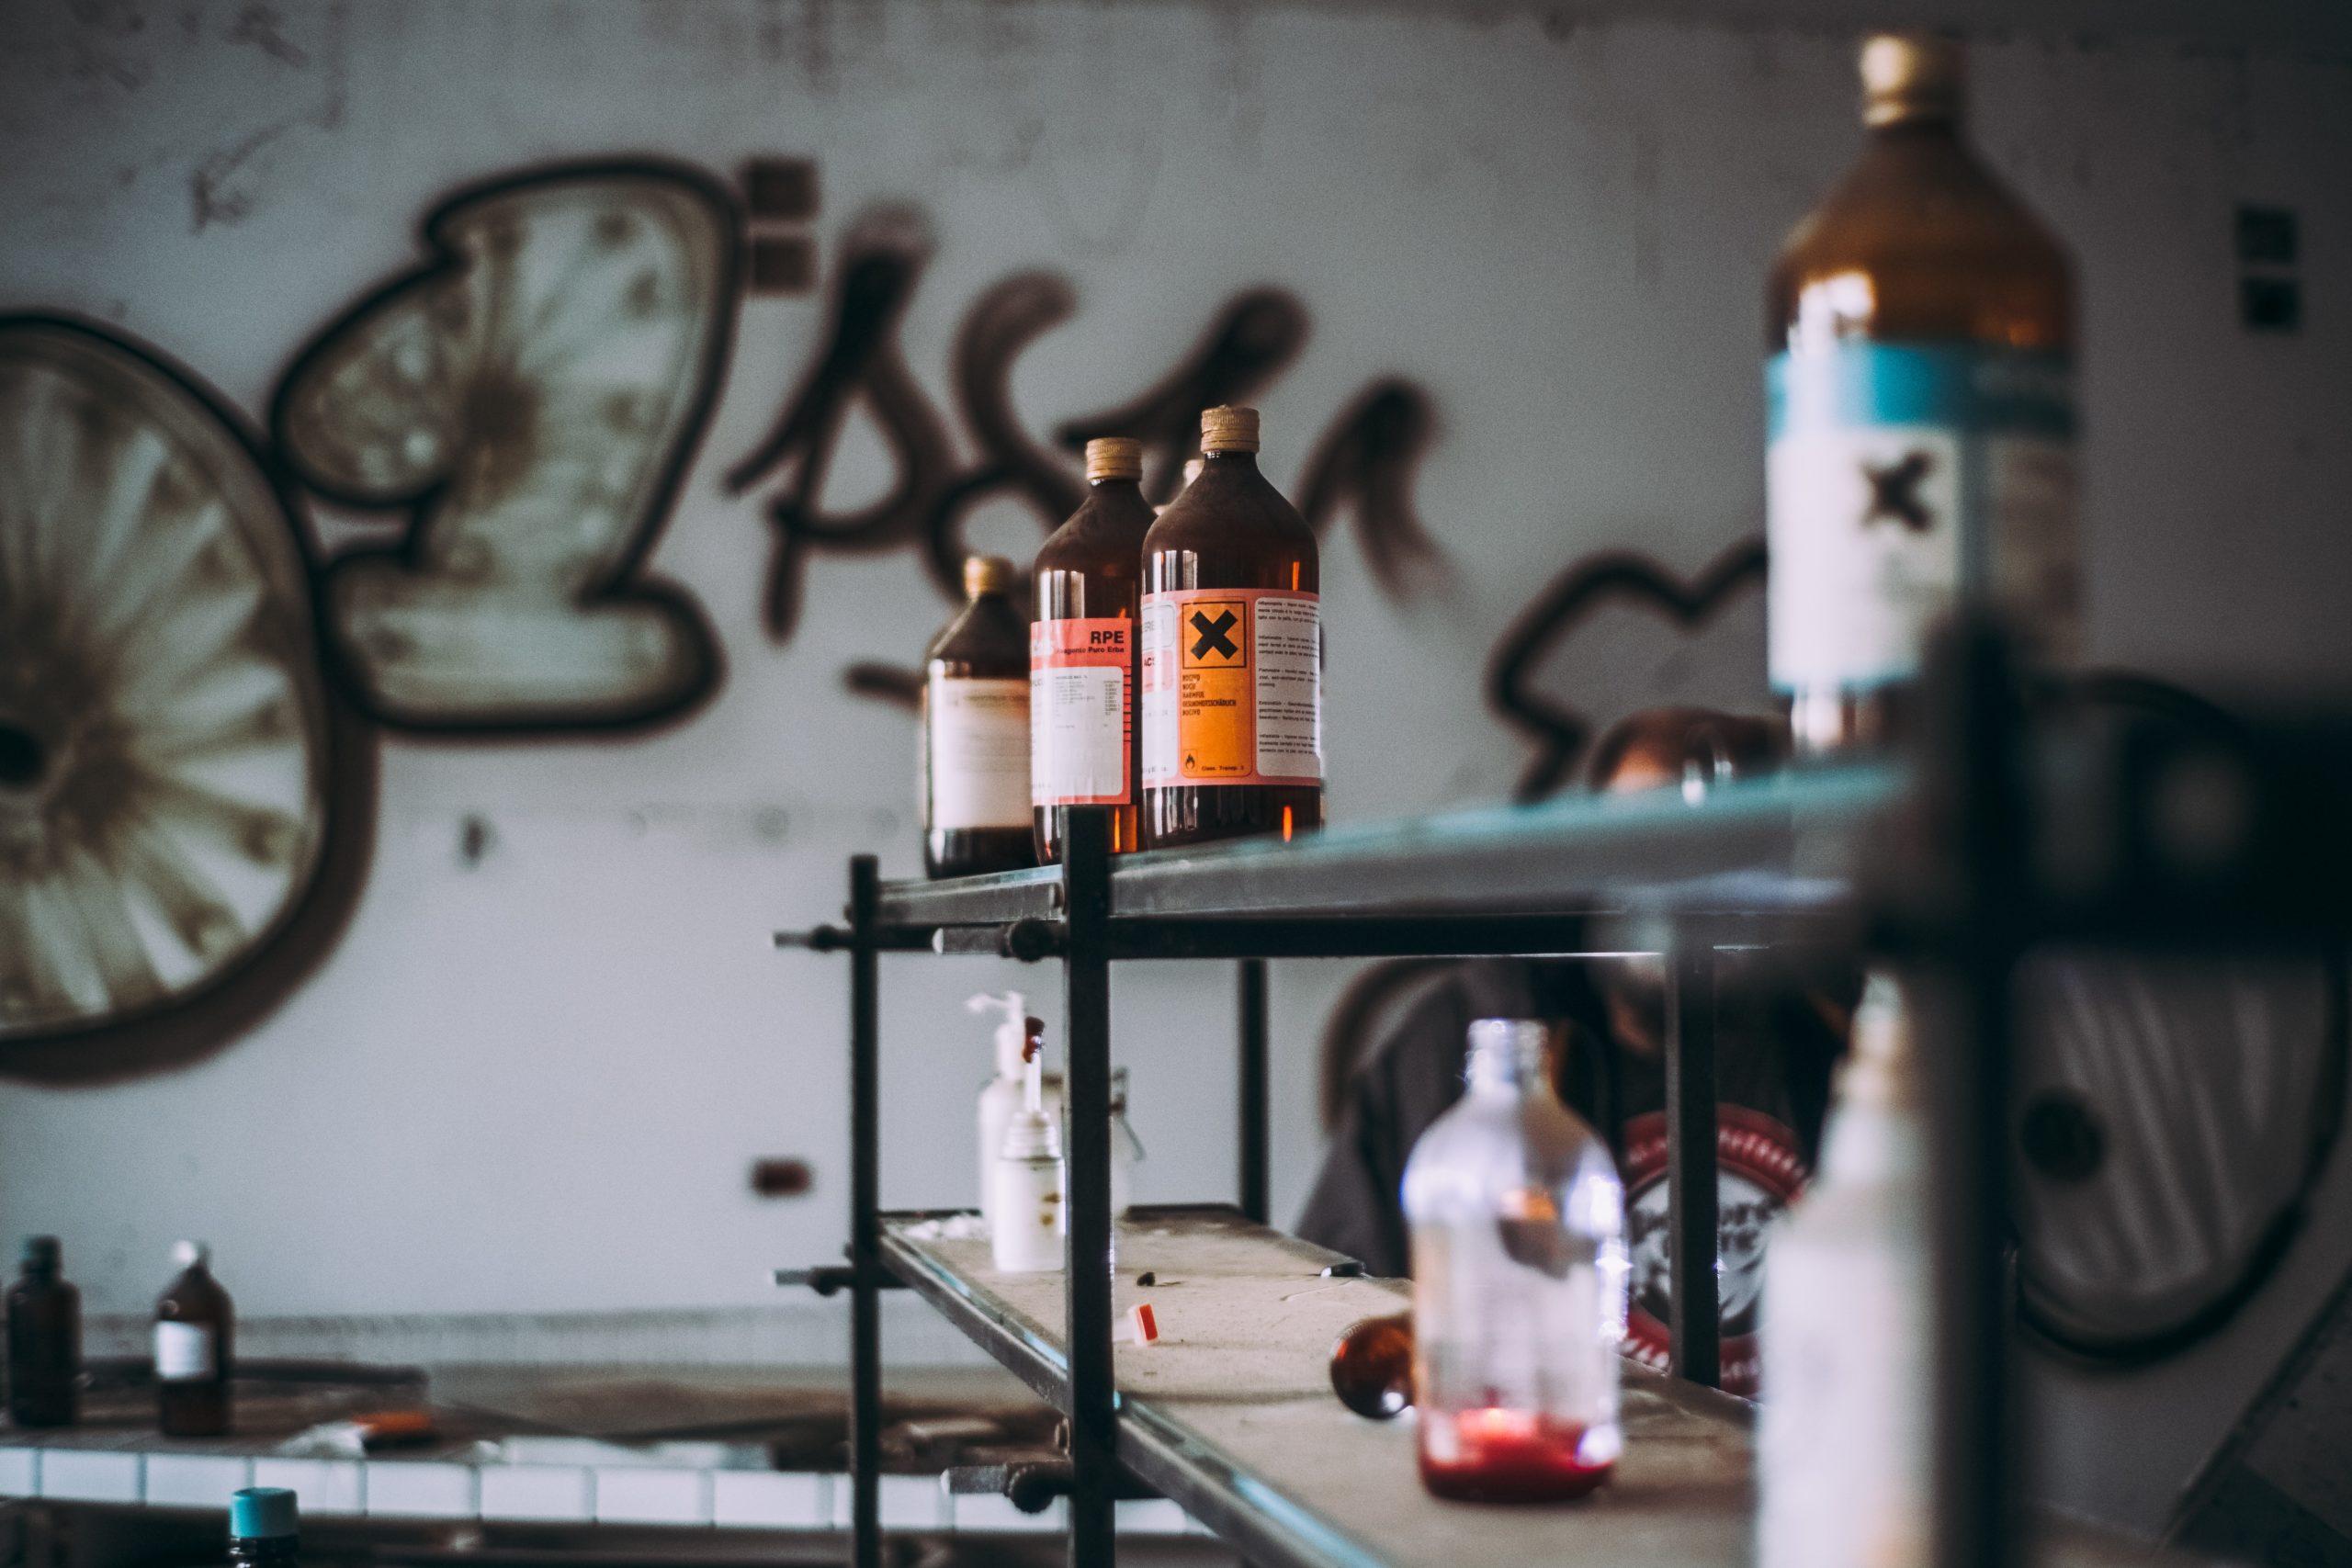 glass-bottles-on-shelf-1771809-scaled